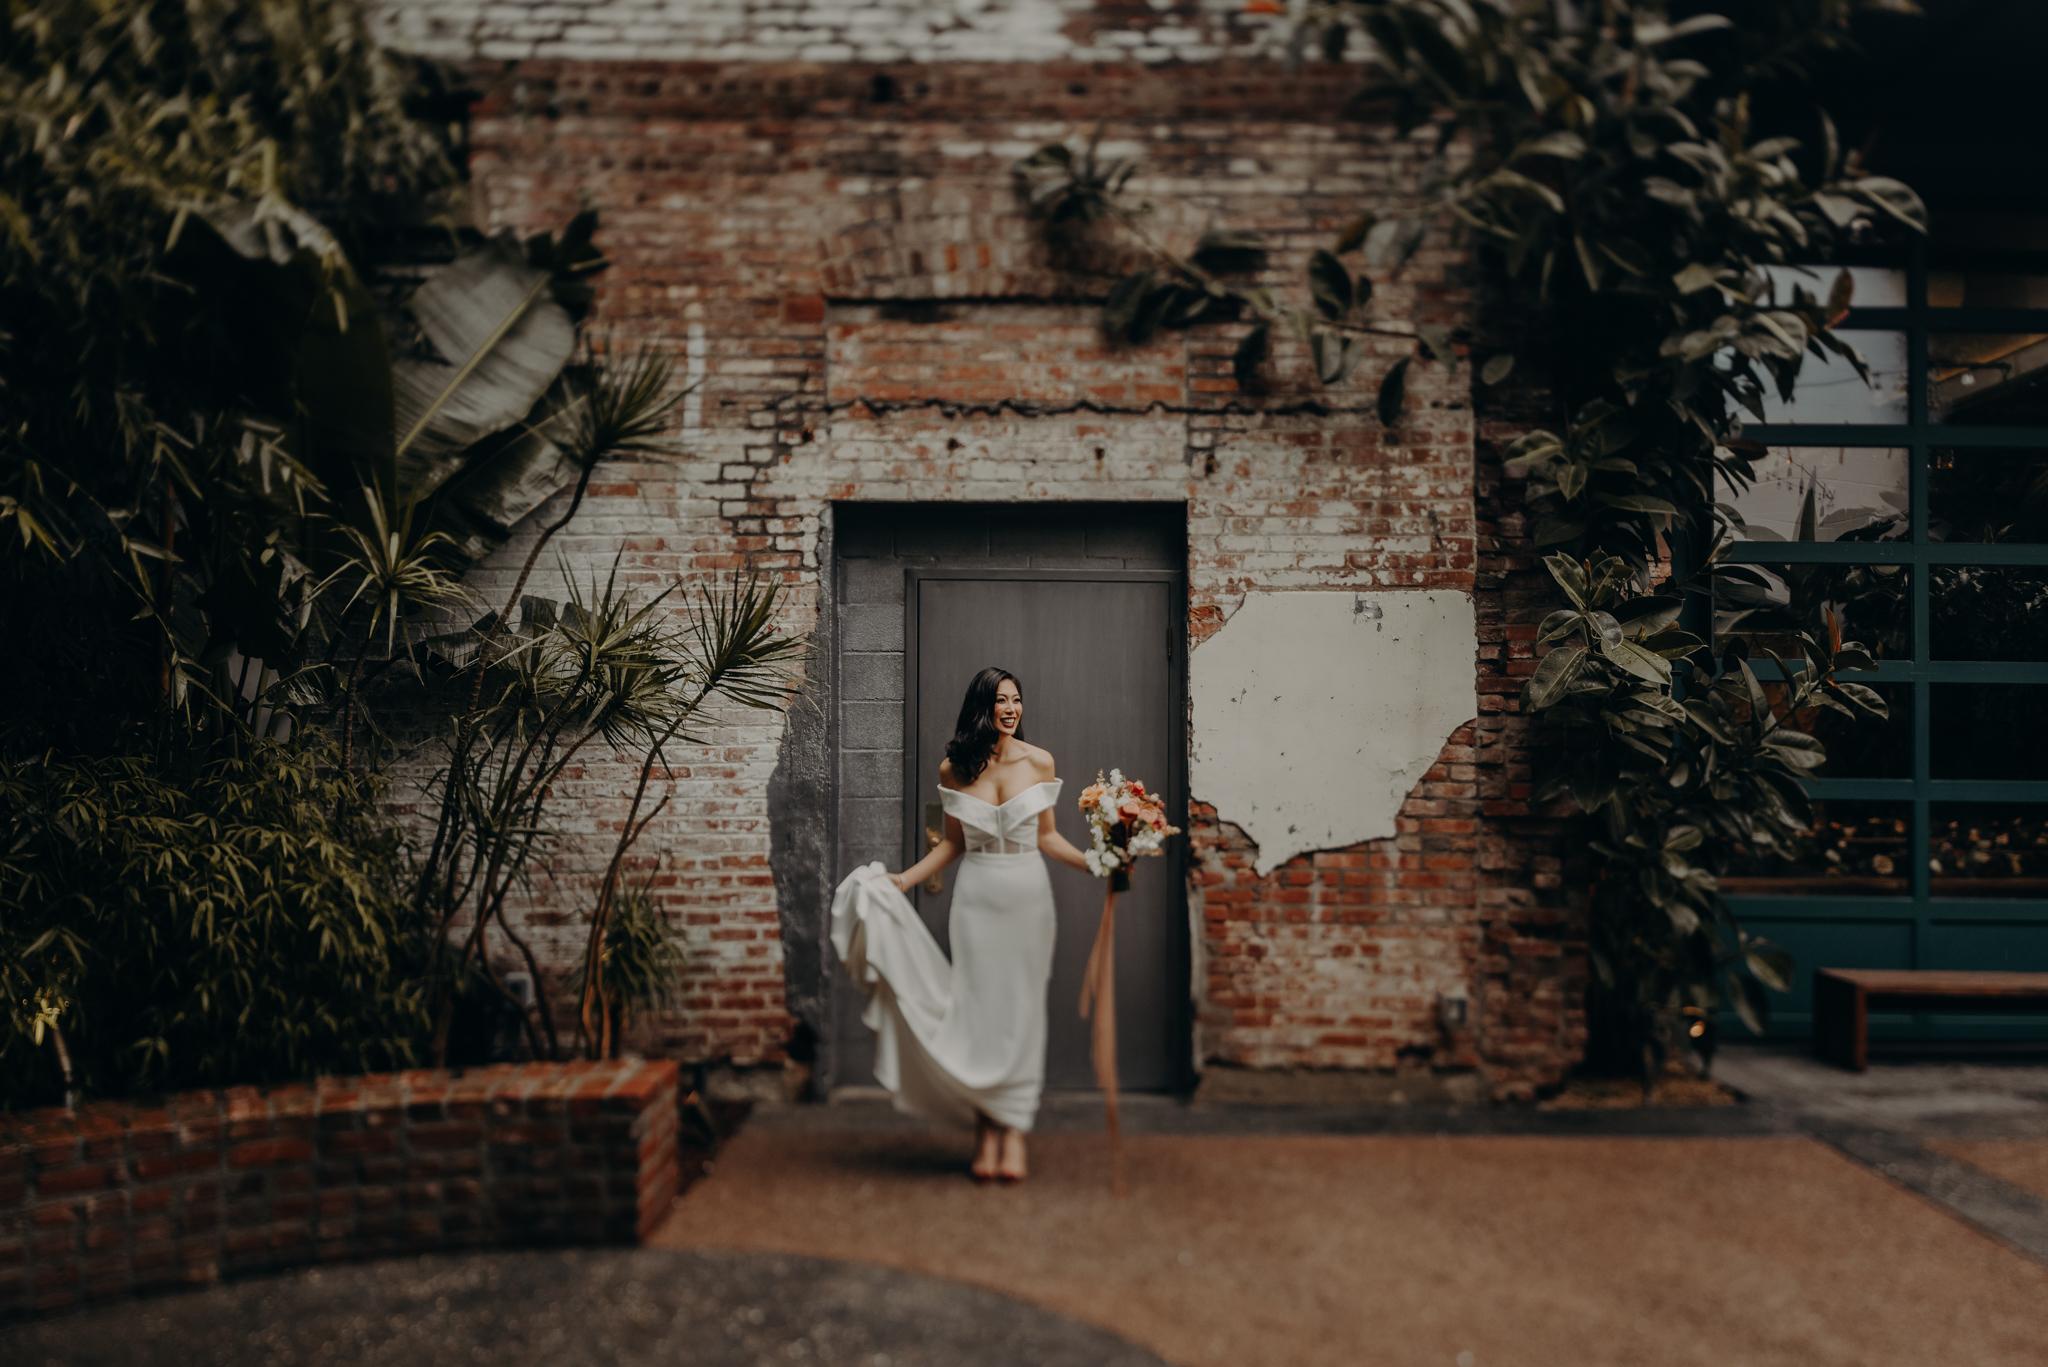 Wedding Photo LA - wedding photographer in los angeles - millwick wedding venue -isaiahandtaylor.com-013.jpg